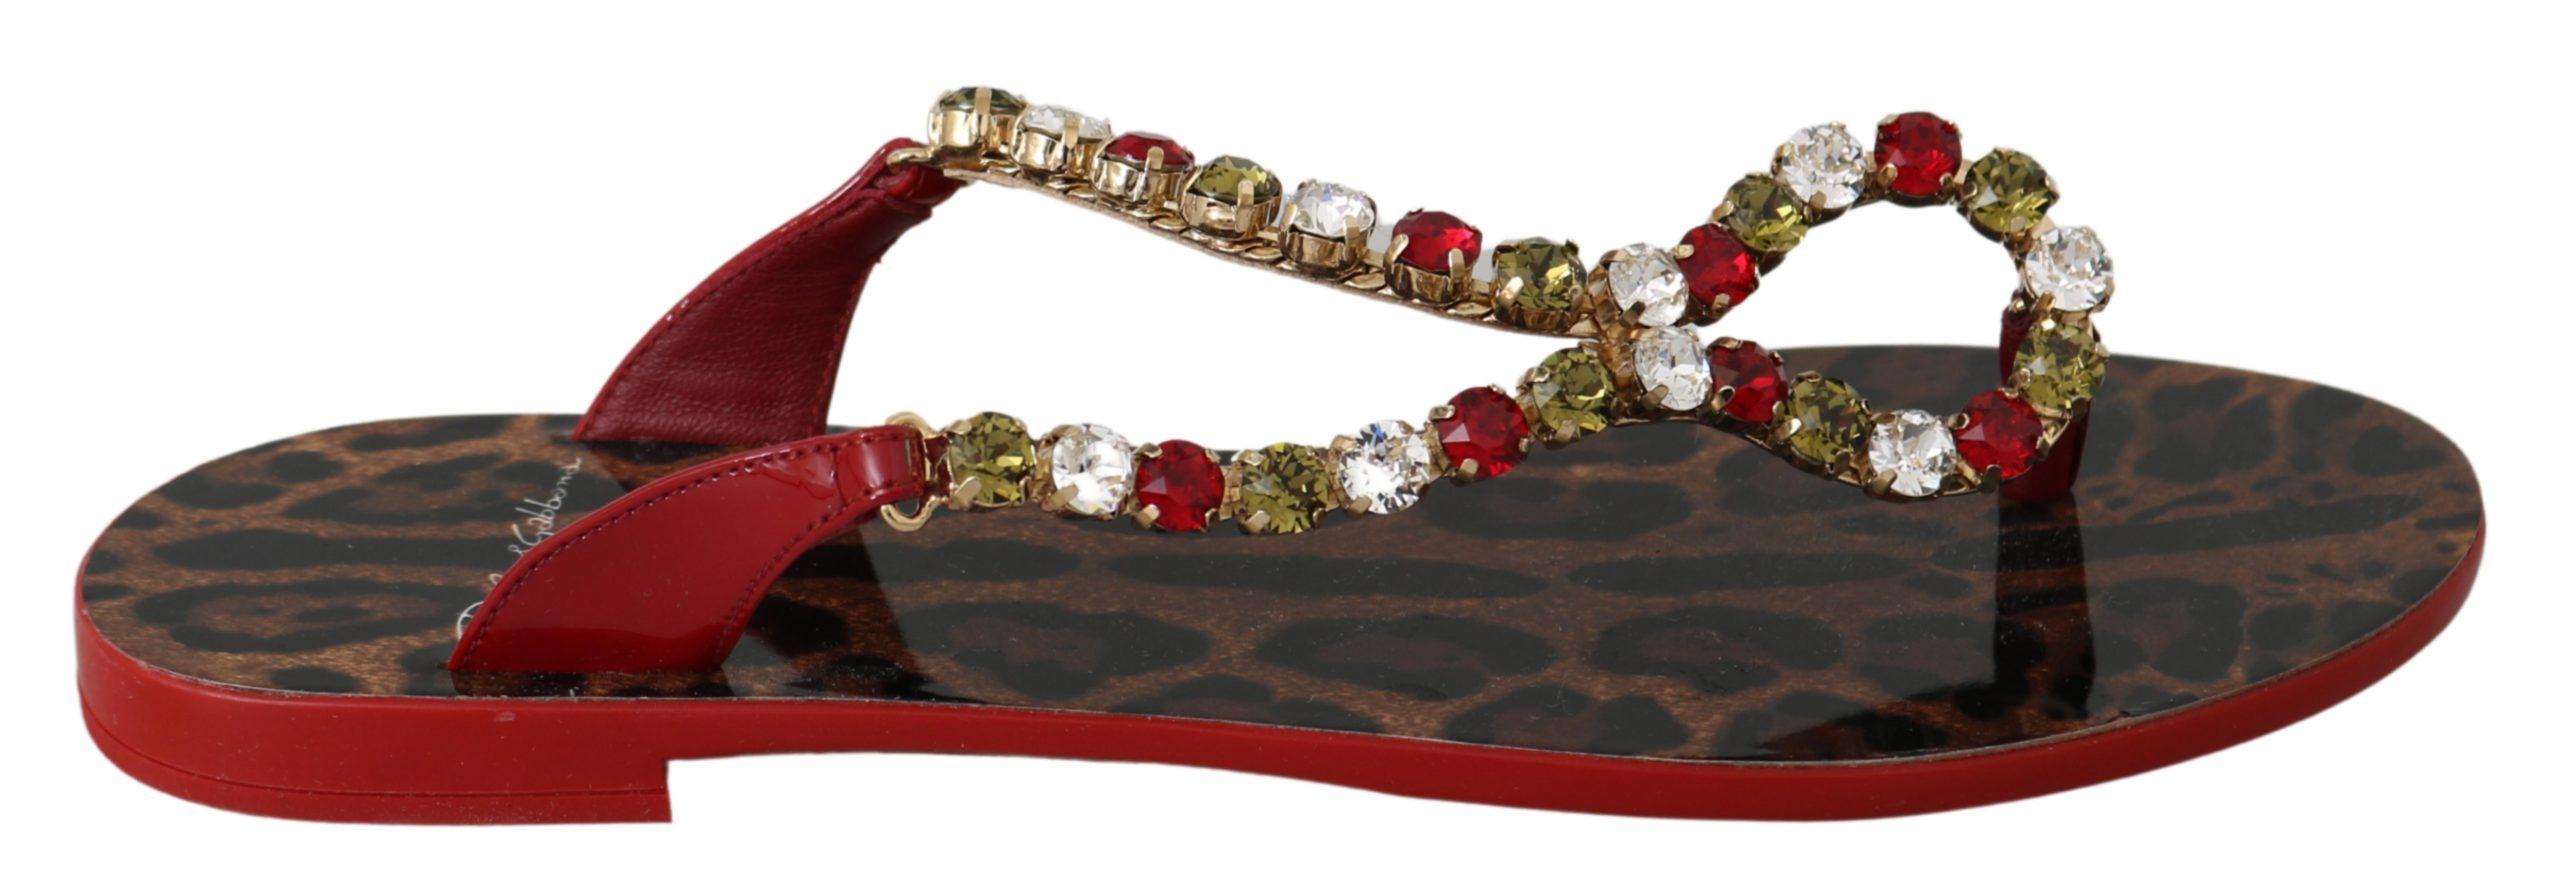 Red Leather Crystal Sandals Flip Flops Shoes - EU35/US4.5